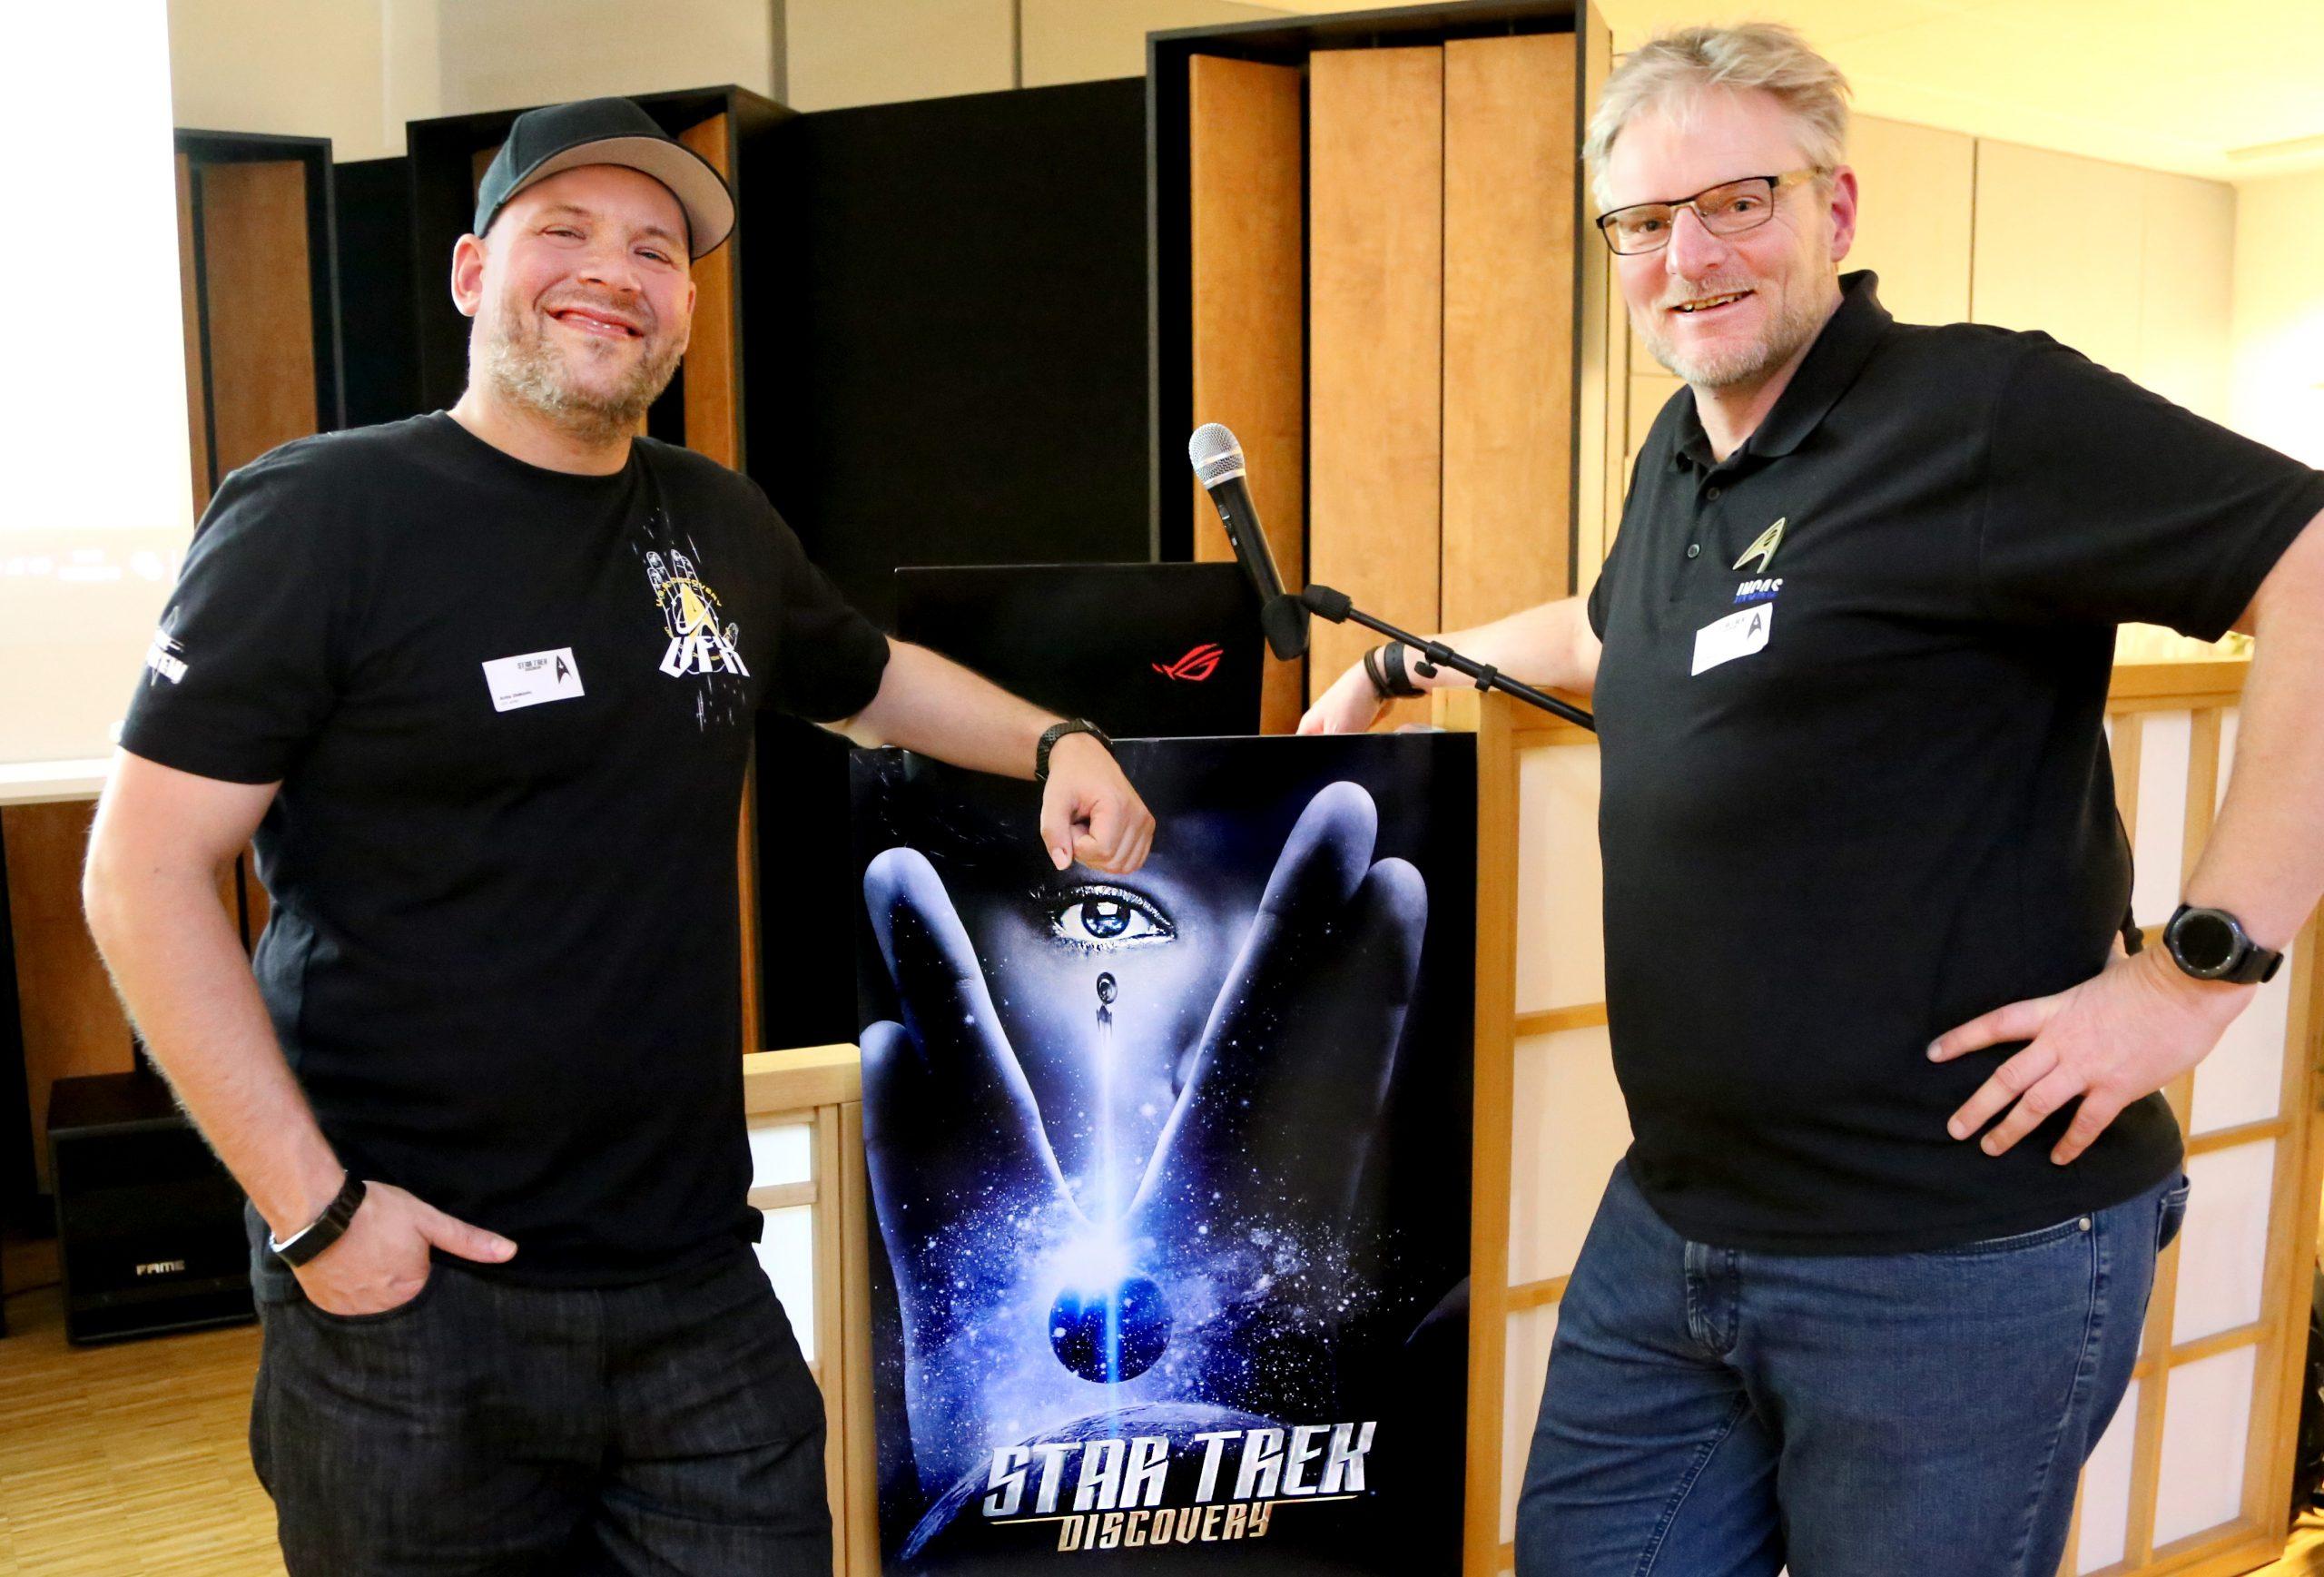 Star Trek Tag in Krefeld